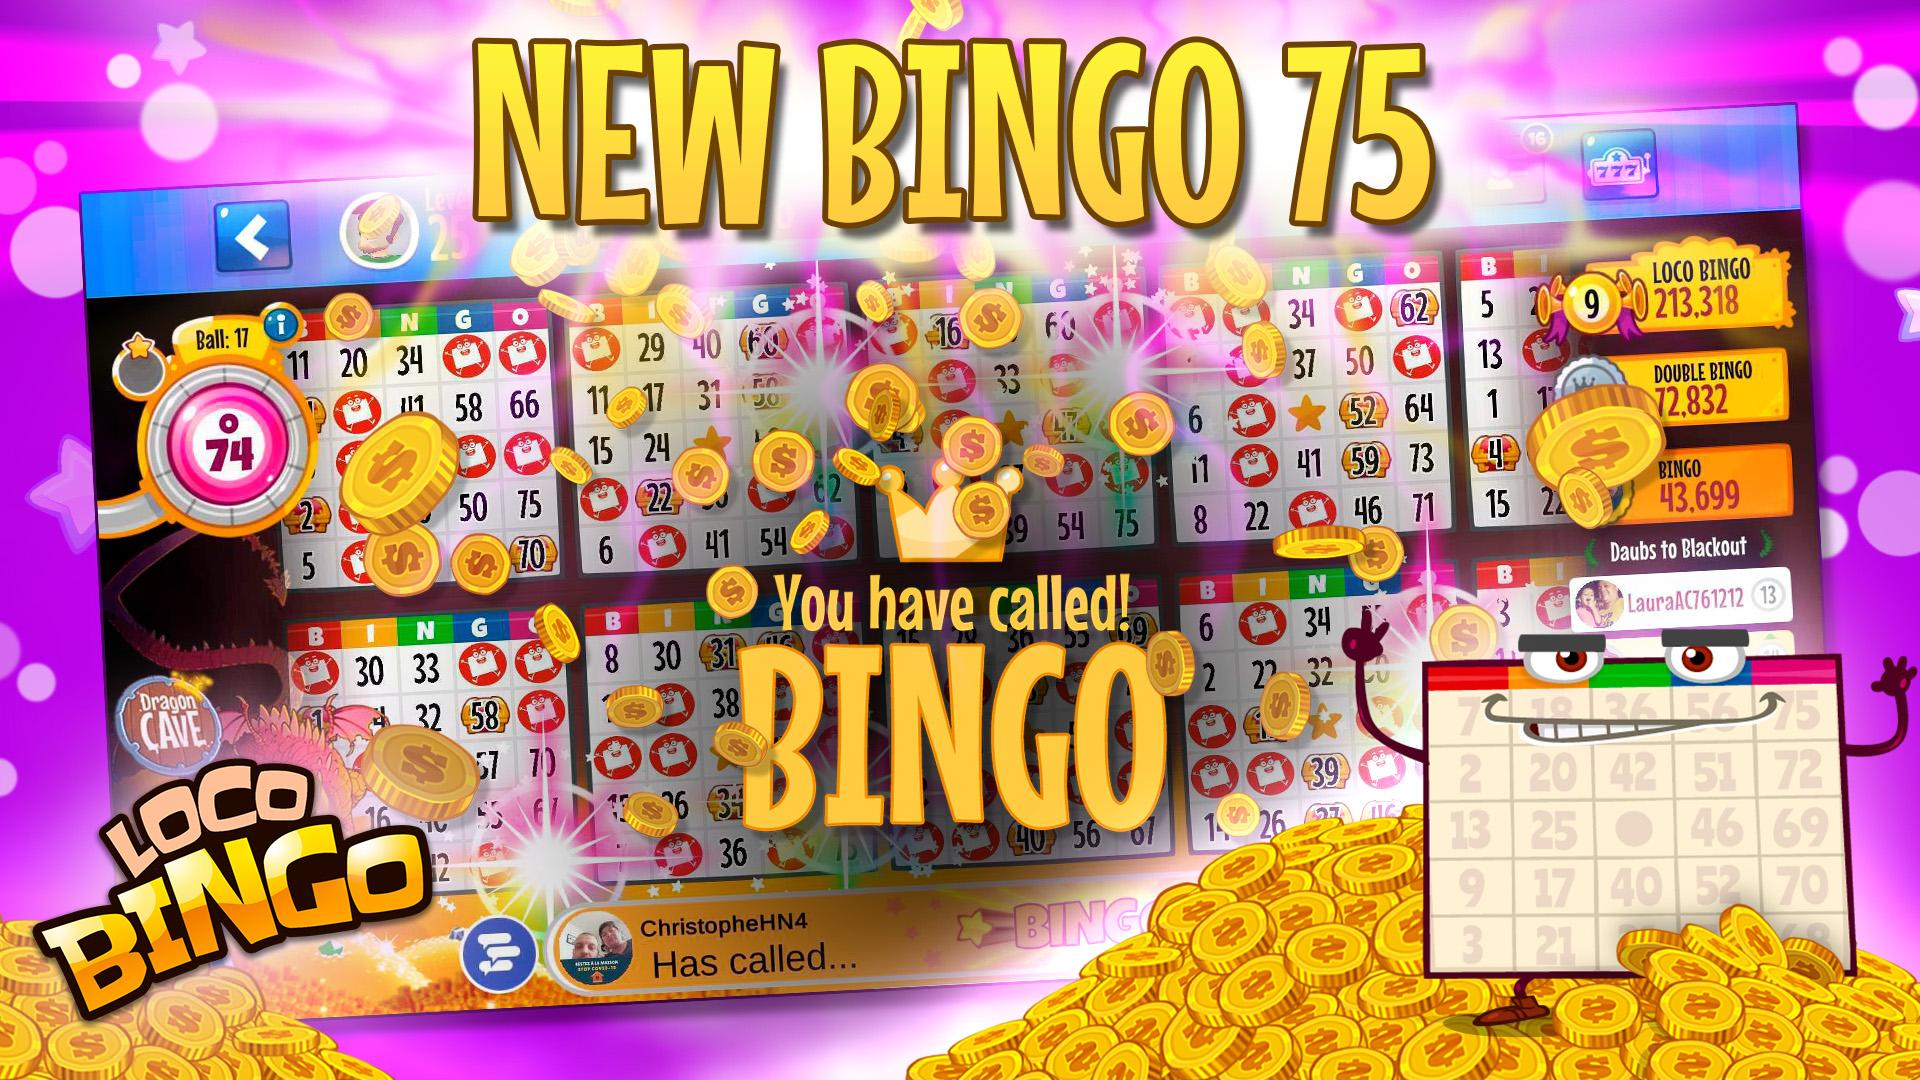 Bingo pelo whatsapp outros 35957